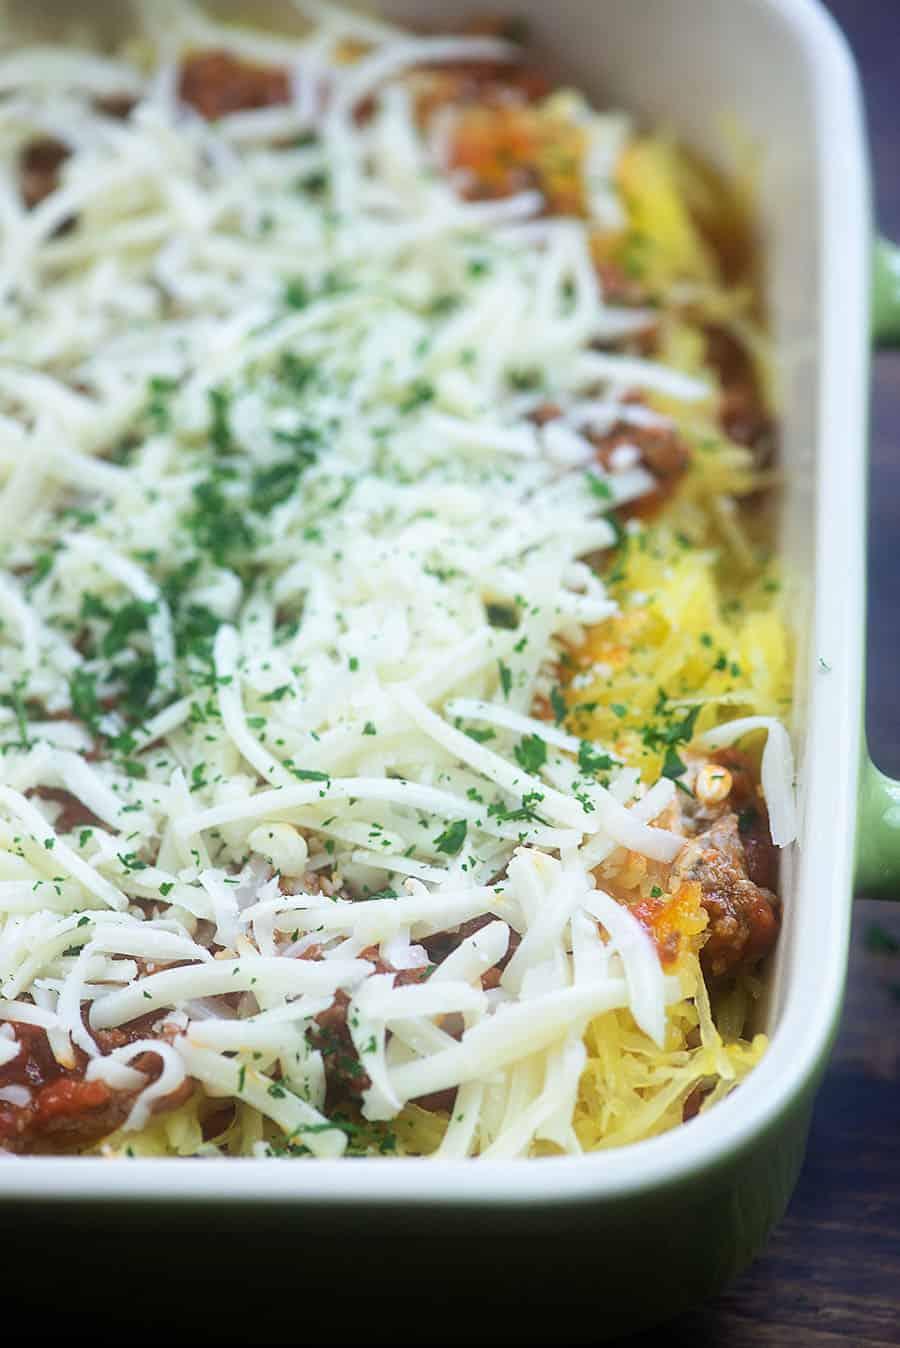 spaghetti squash casserole in baking dish